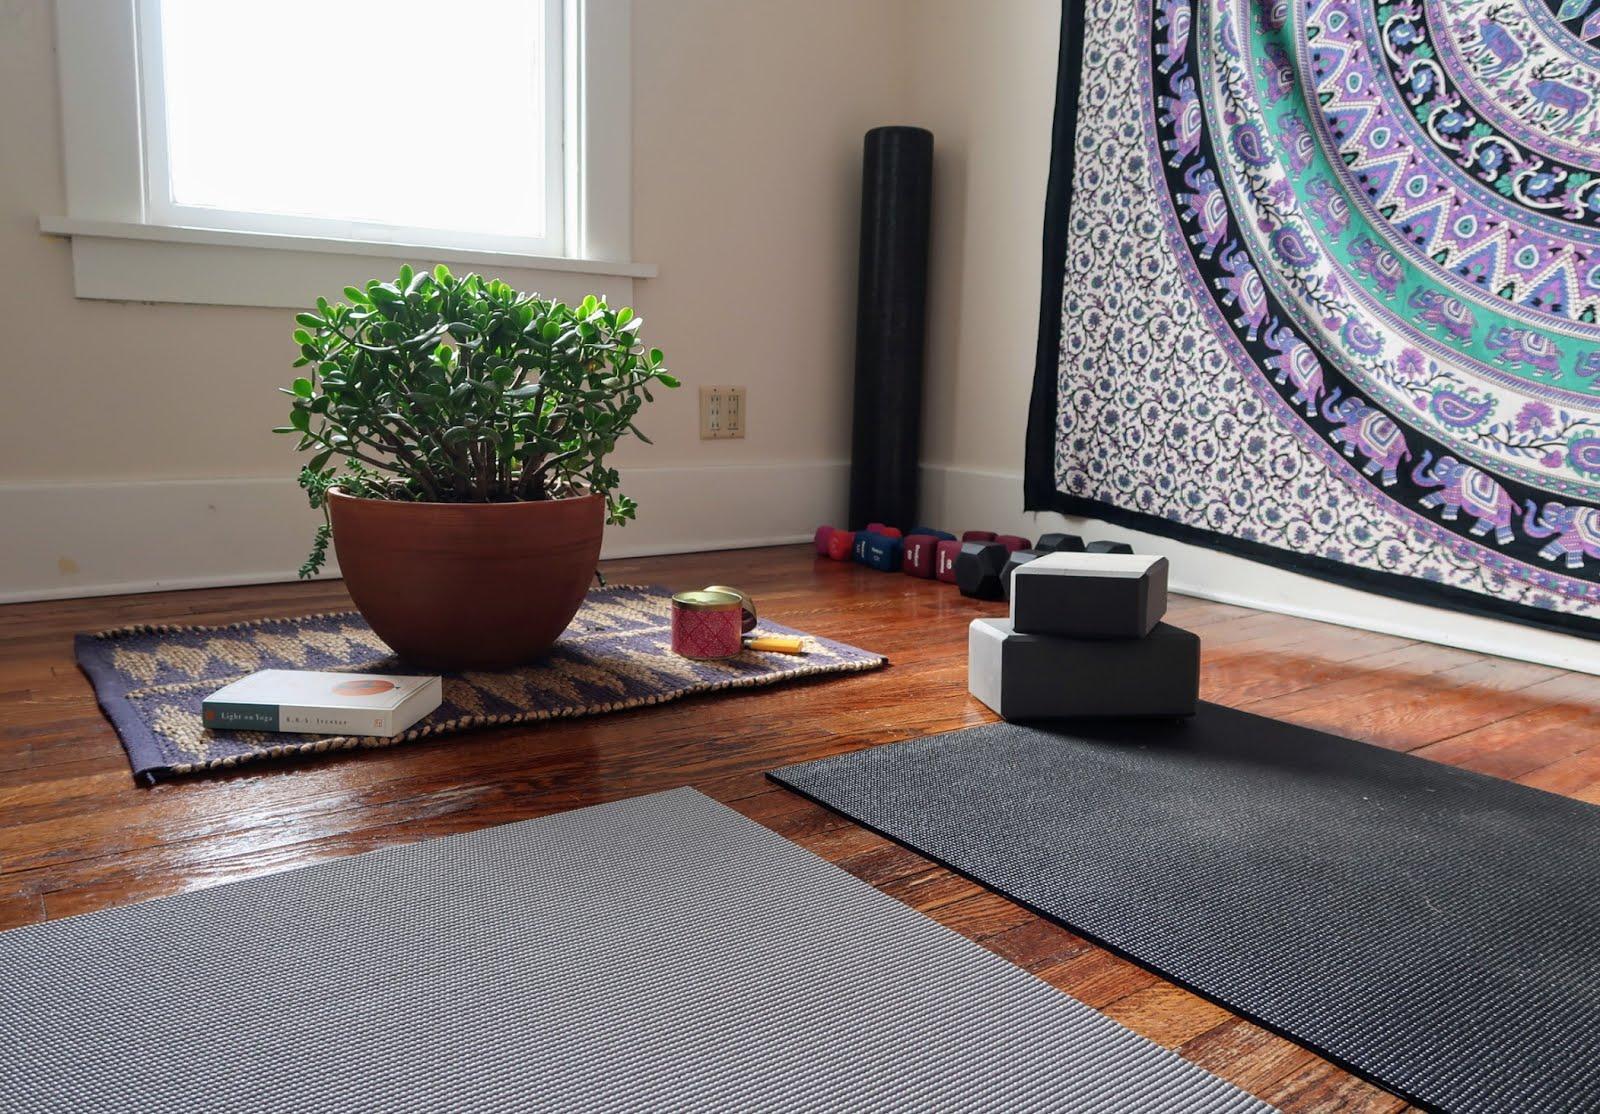 yoga healthy resolution new year goals fitness yogi mat succulent